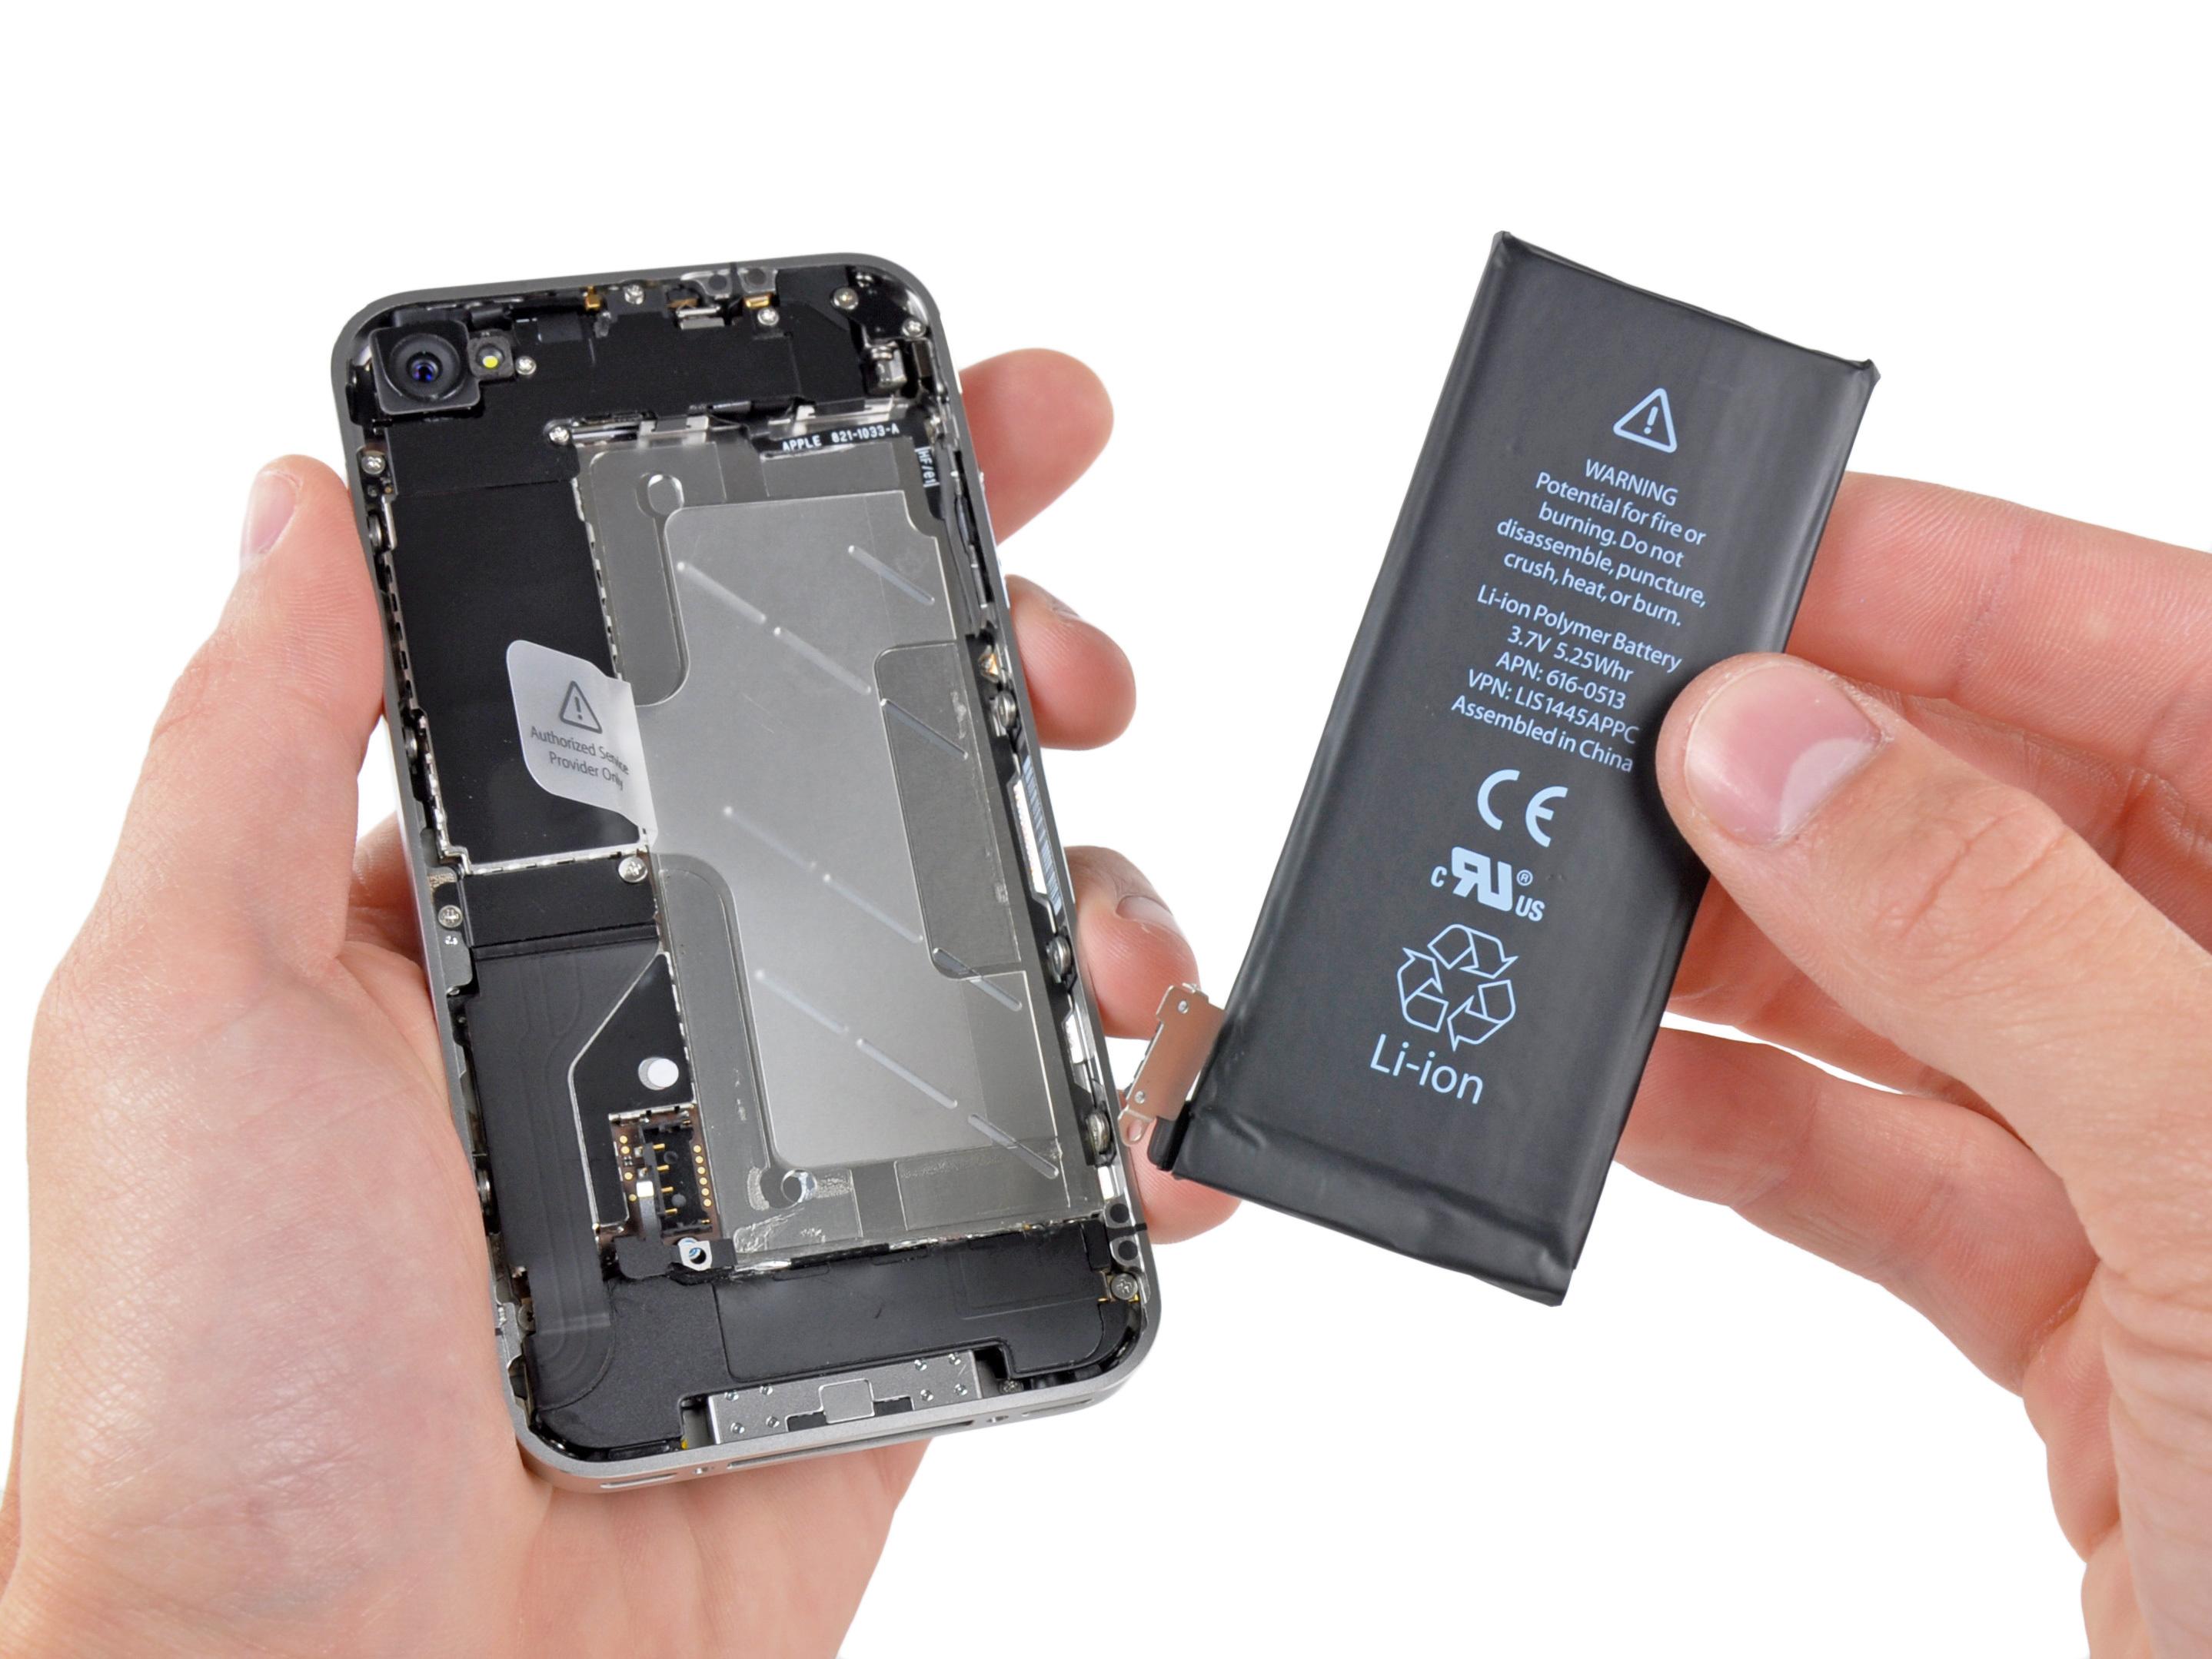 Broken Iphone Battery Wallpaper Iphone 4 Battery Replacement Ifixit Repair Guide